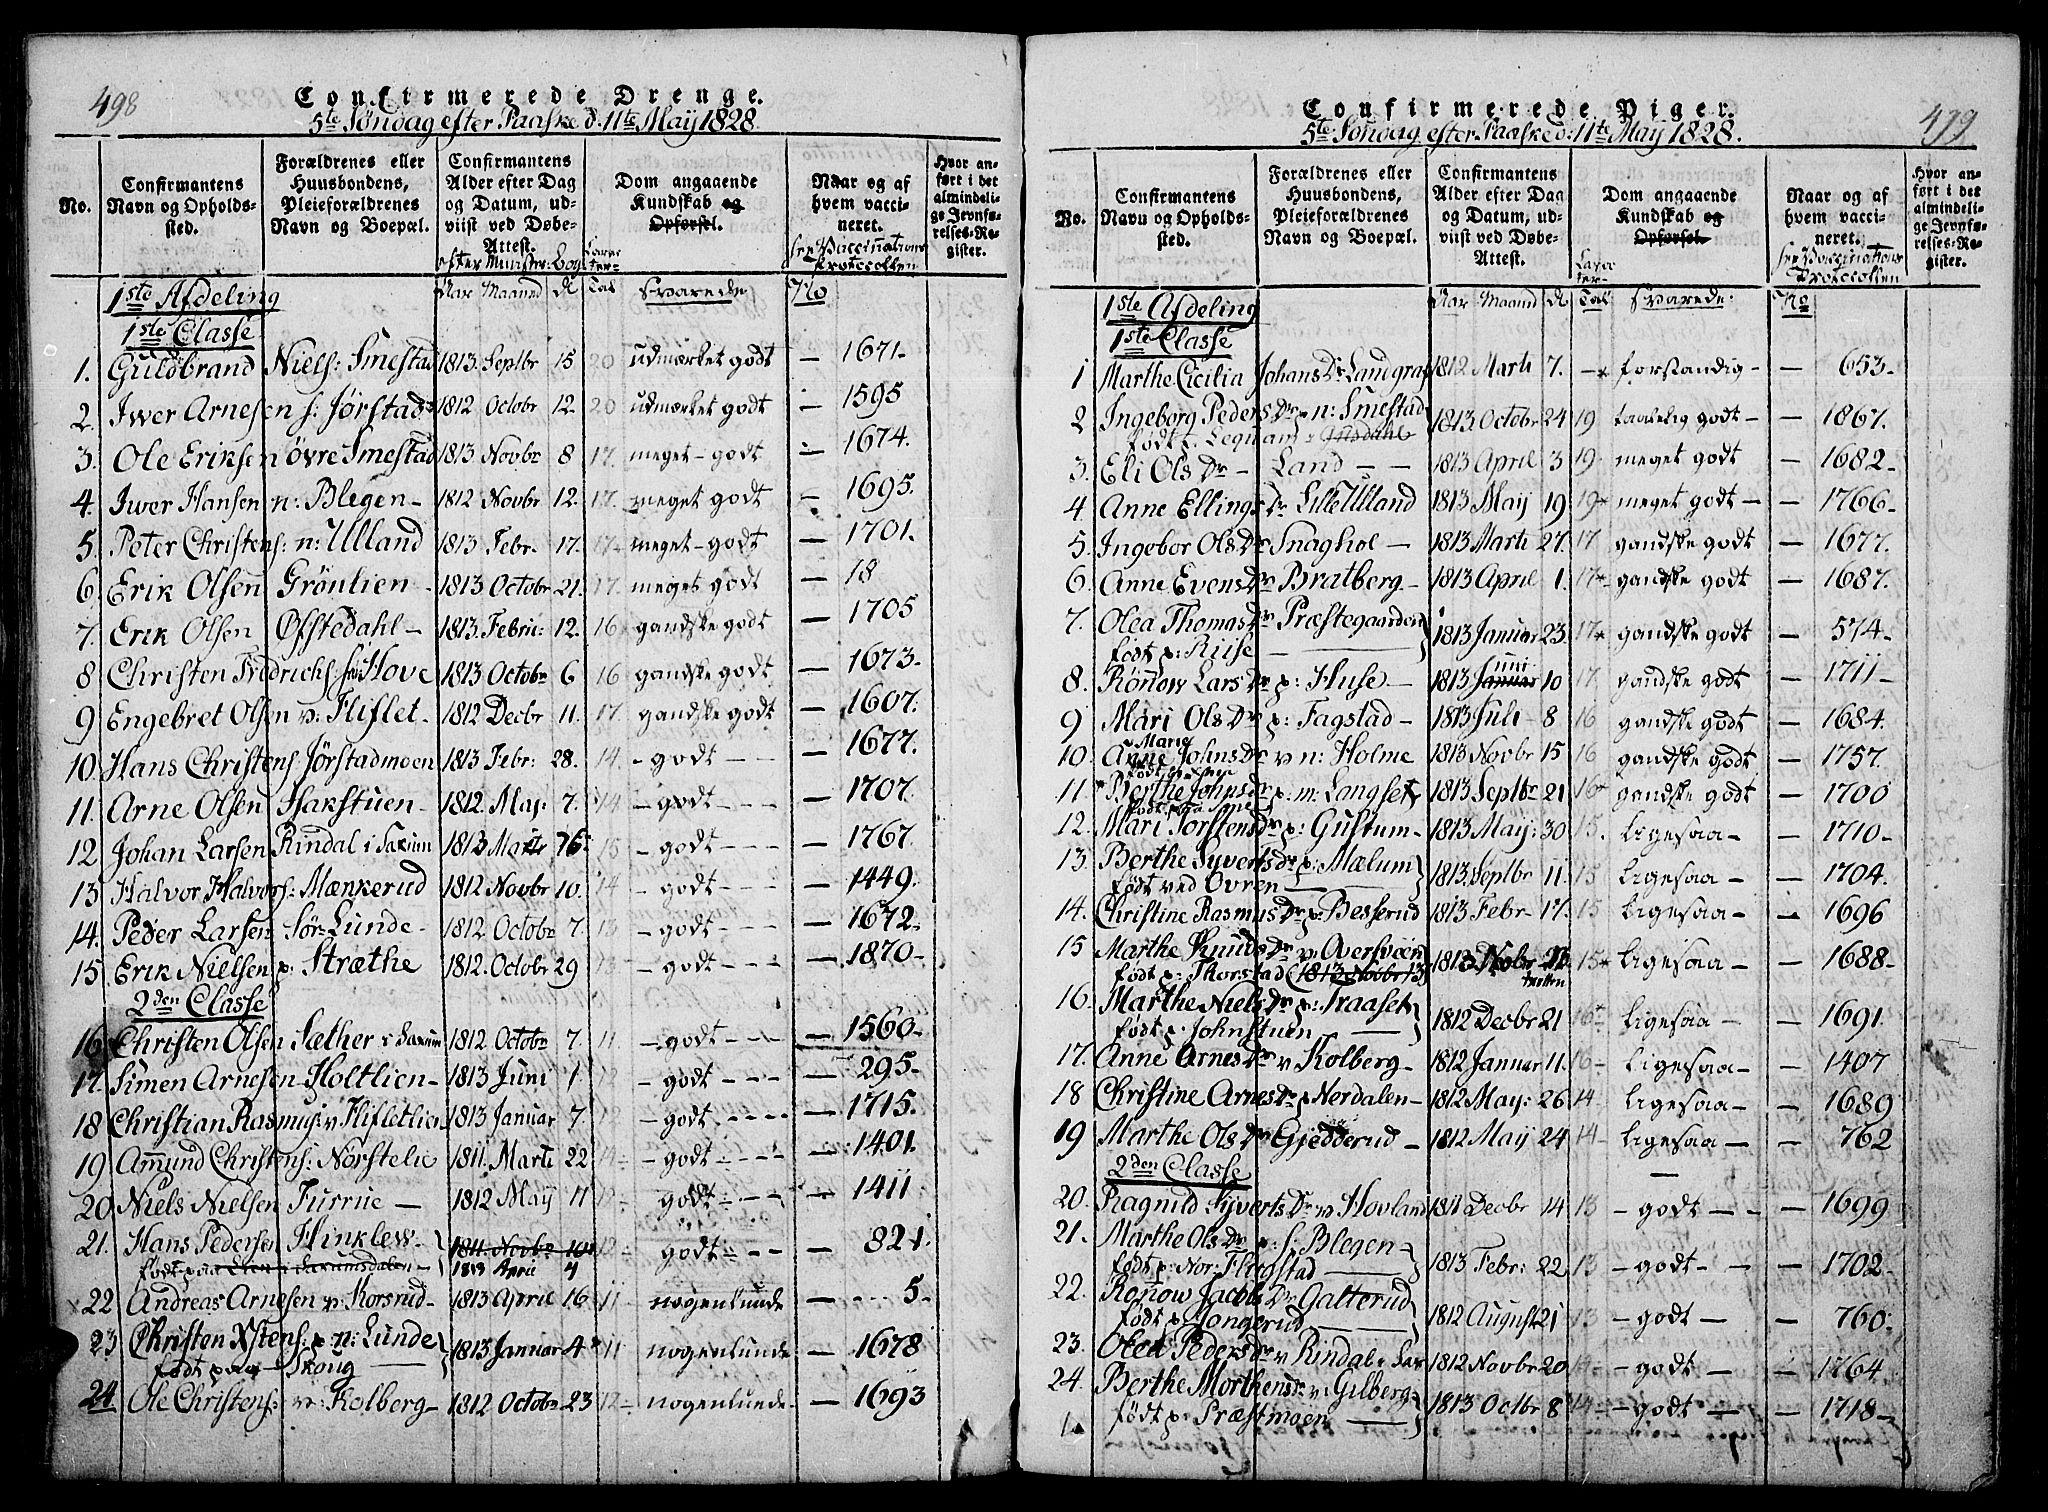 SAH, Fåberg prestekontor, Ministerialbok nr. 3, 1818-1833, s. 498-499